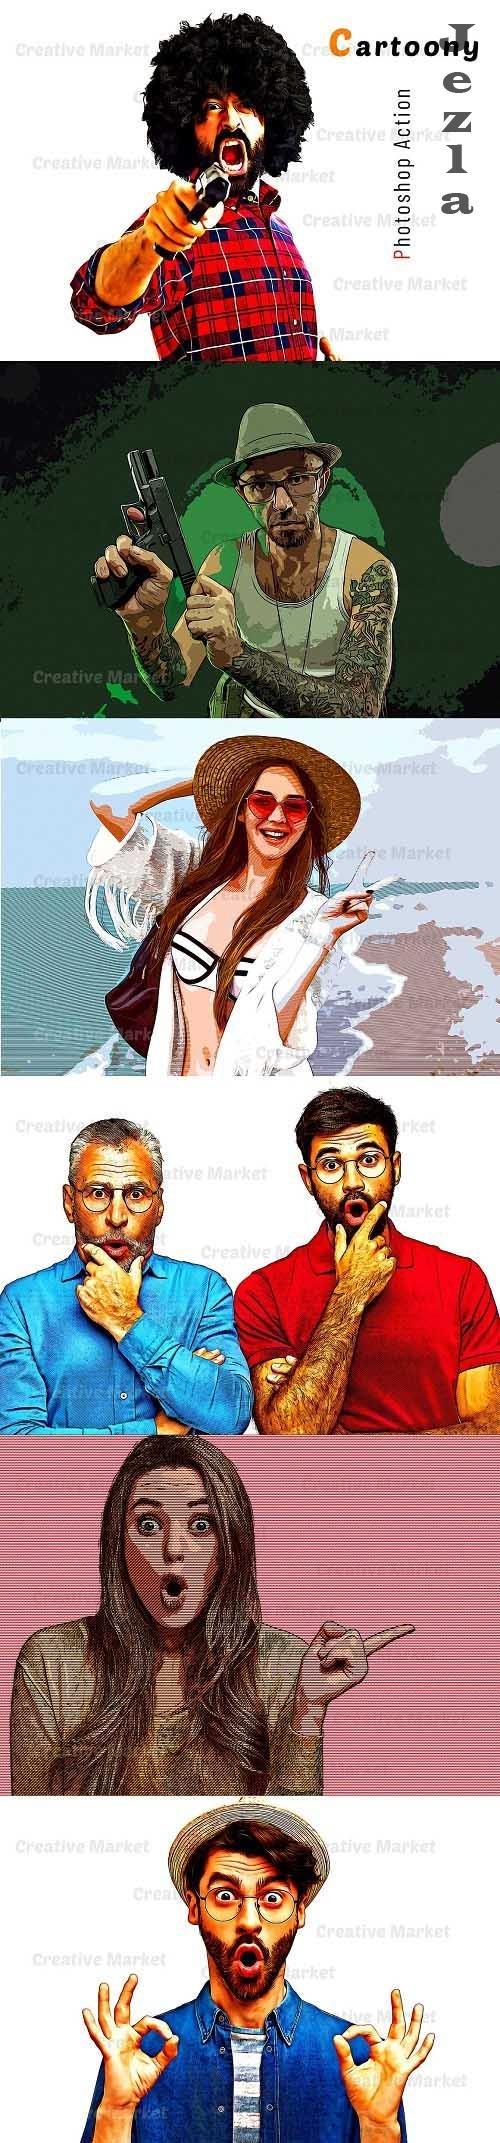 Cartoony Photoshop Action - 6567073